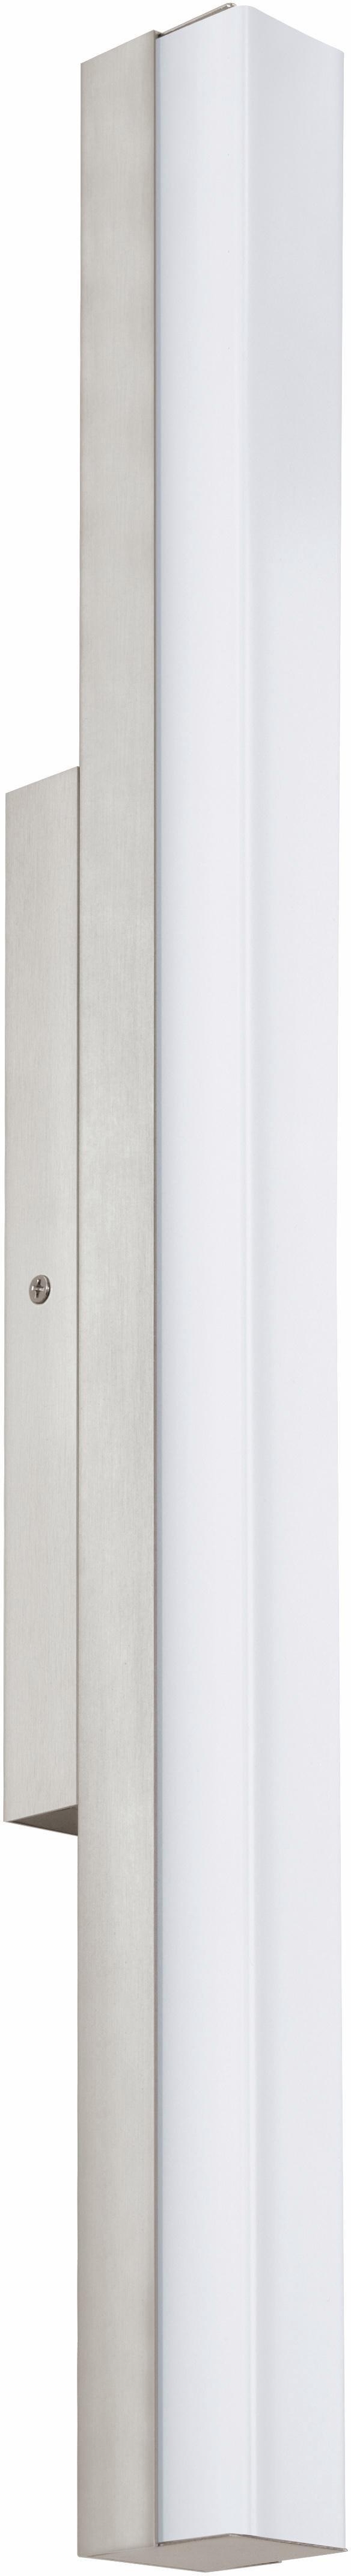 Eglo led-wandlamp »TORRETTA«, in de webshop van OTTO kopen